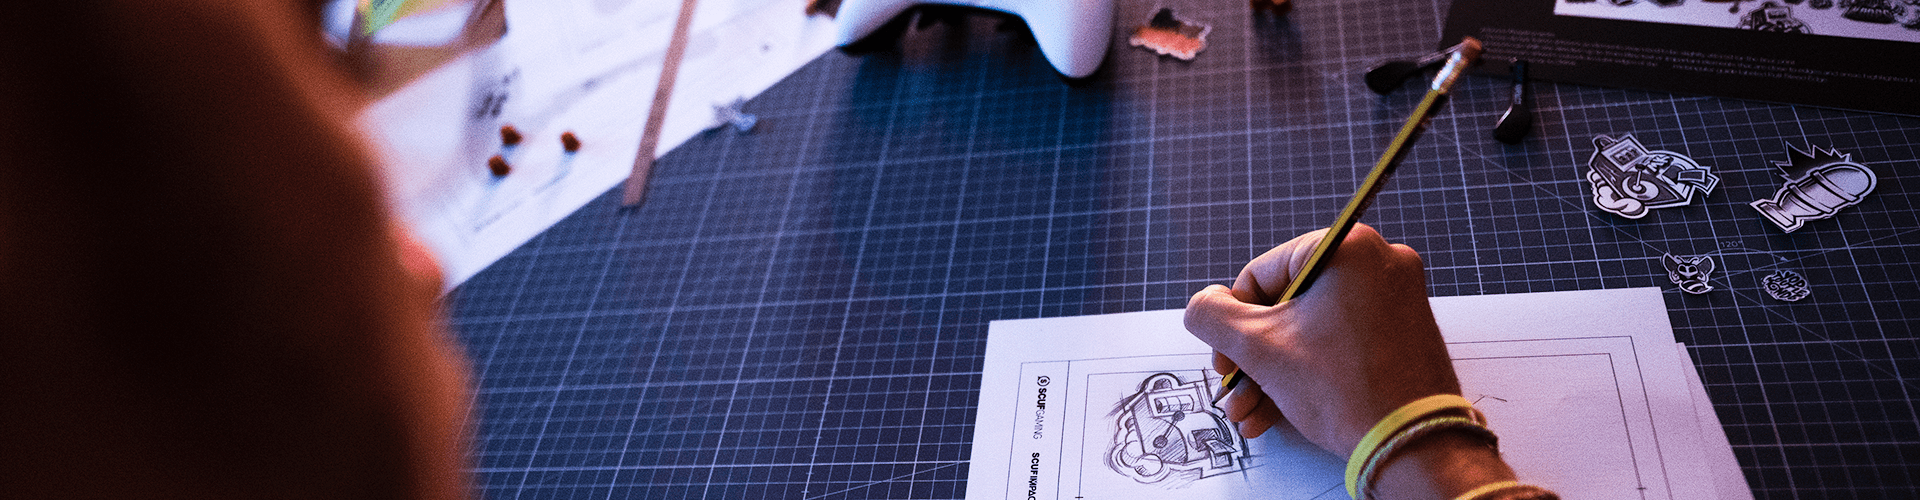 Illustration BANNIERE WORK min – THURB